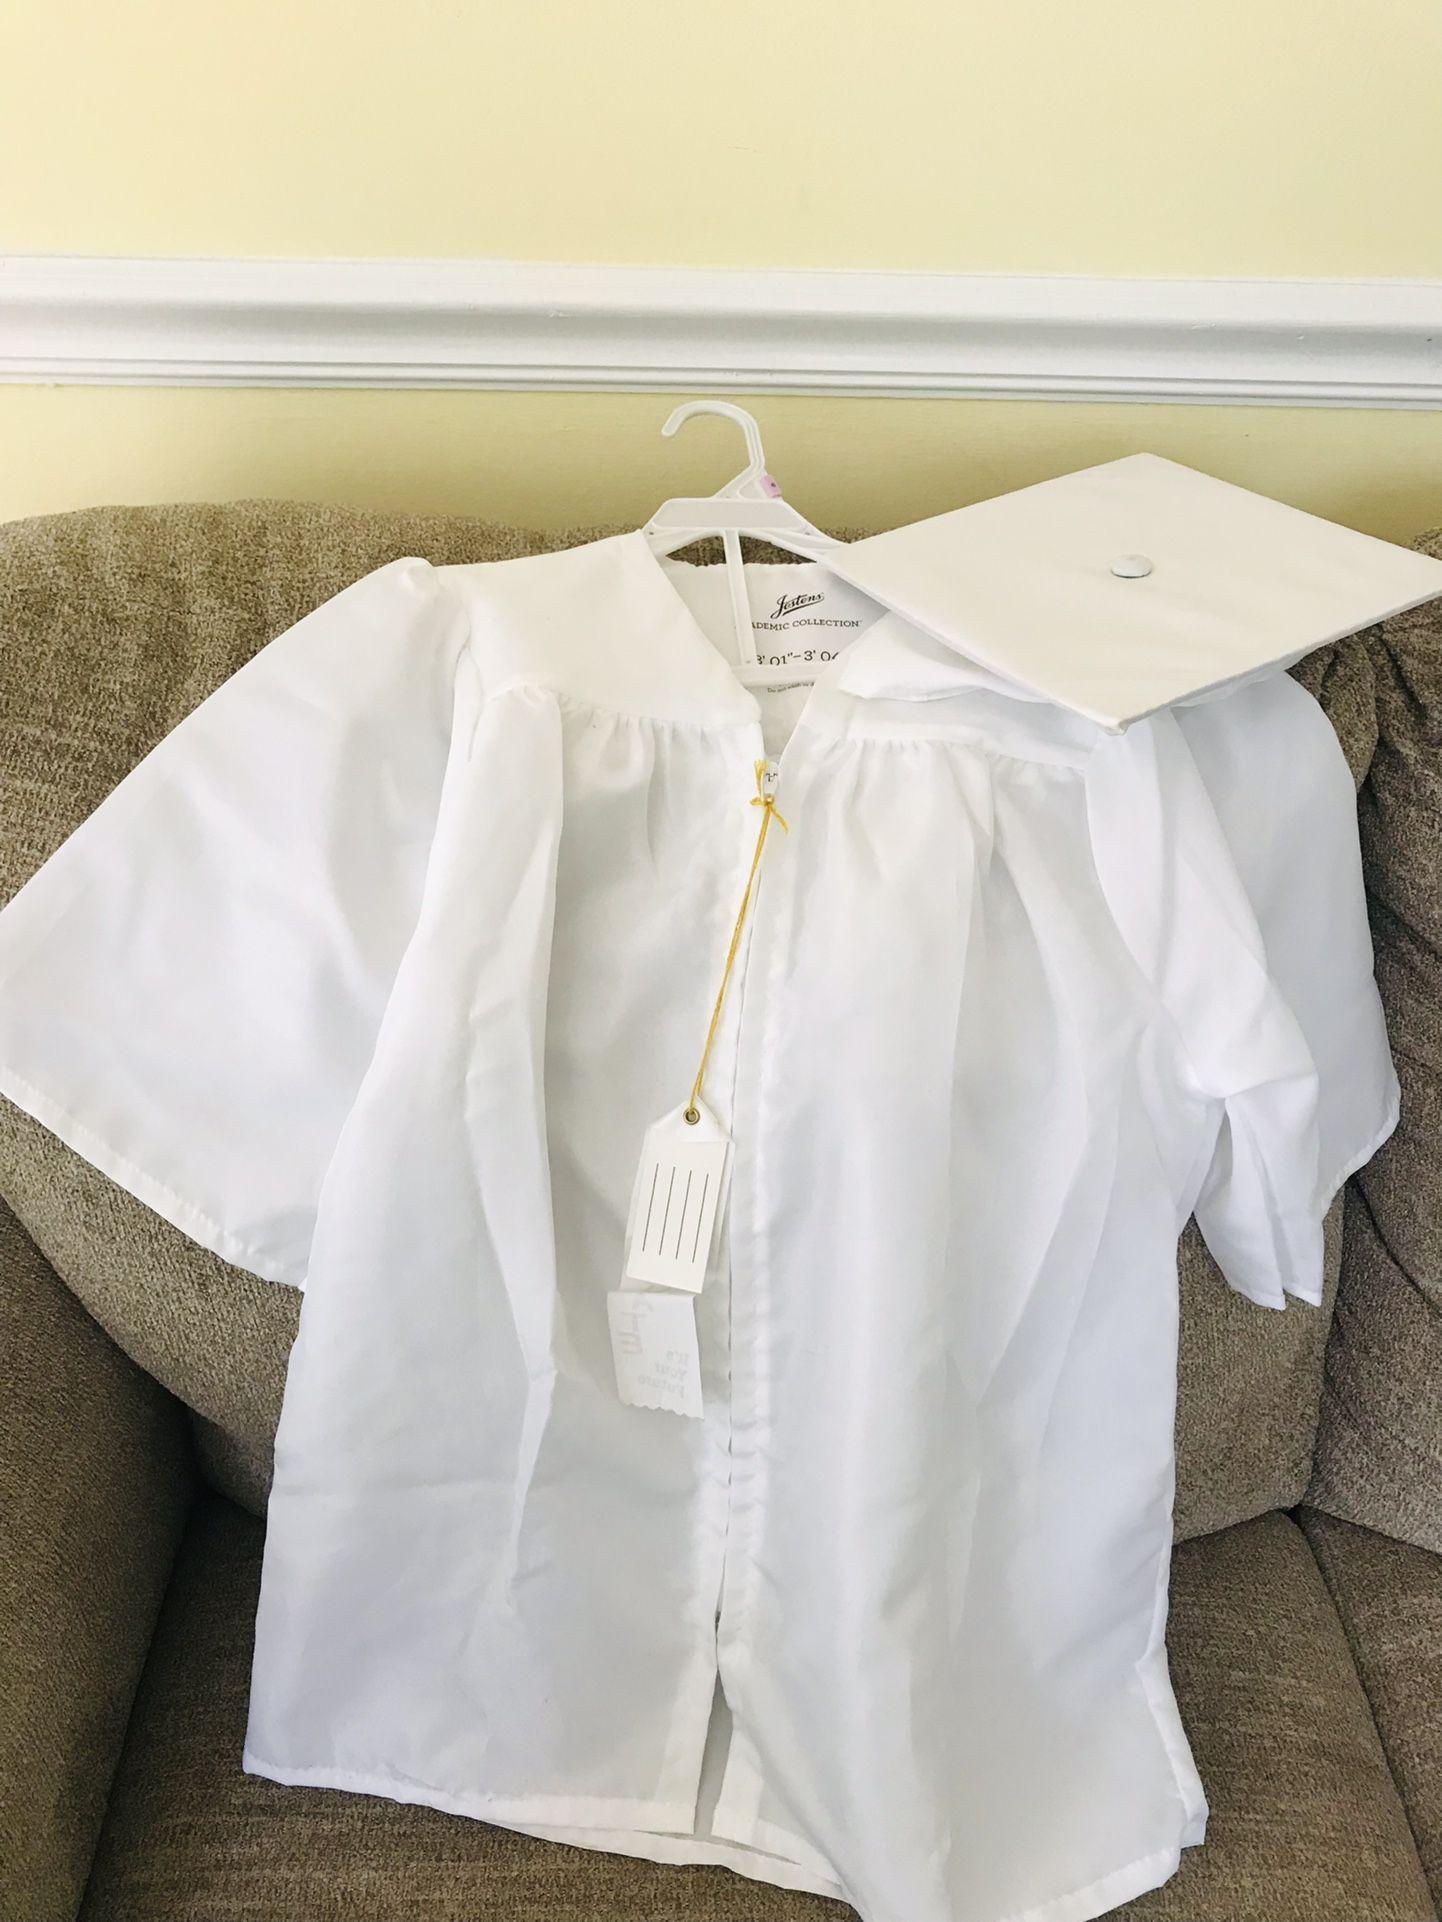 Preschool Graduation Gown And Hat